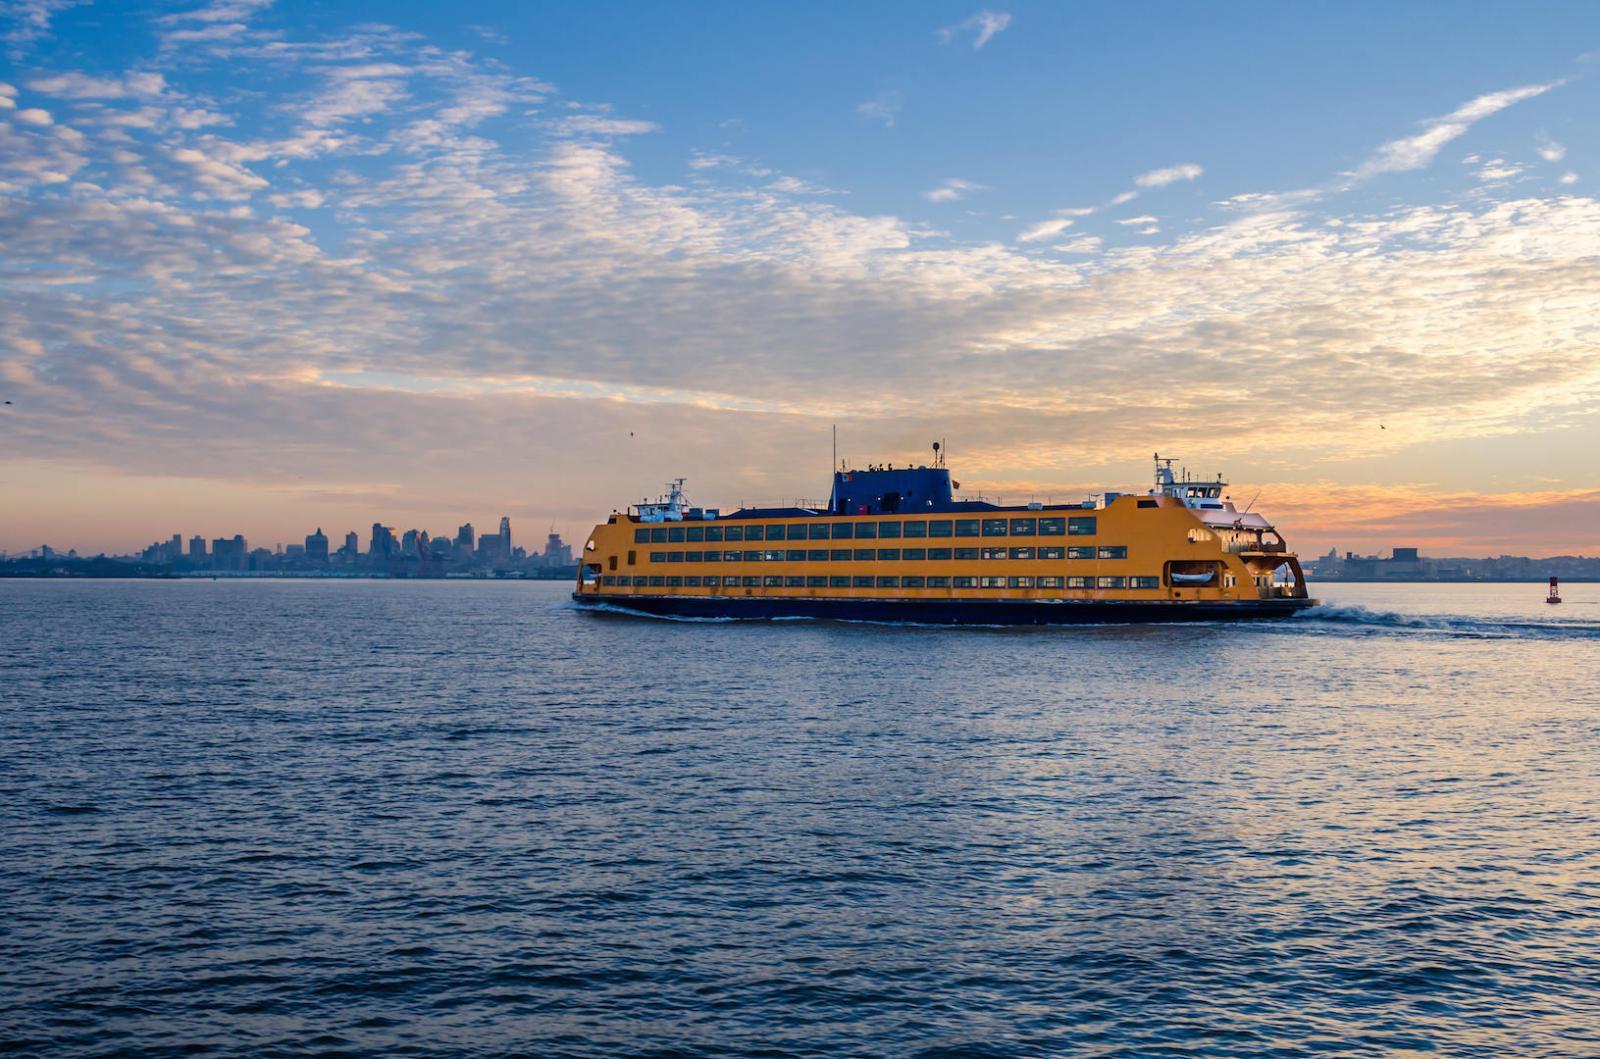 The Free Staten Island Ferry